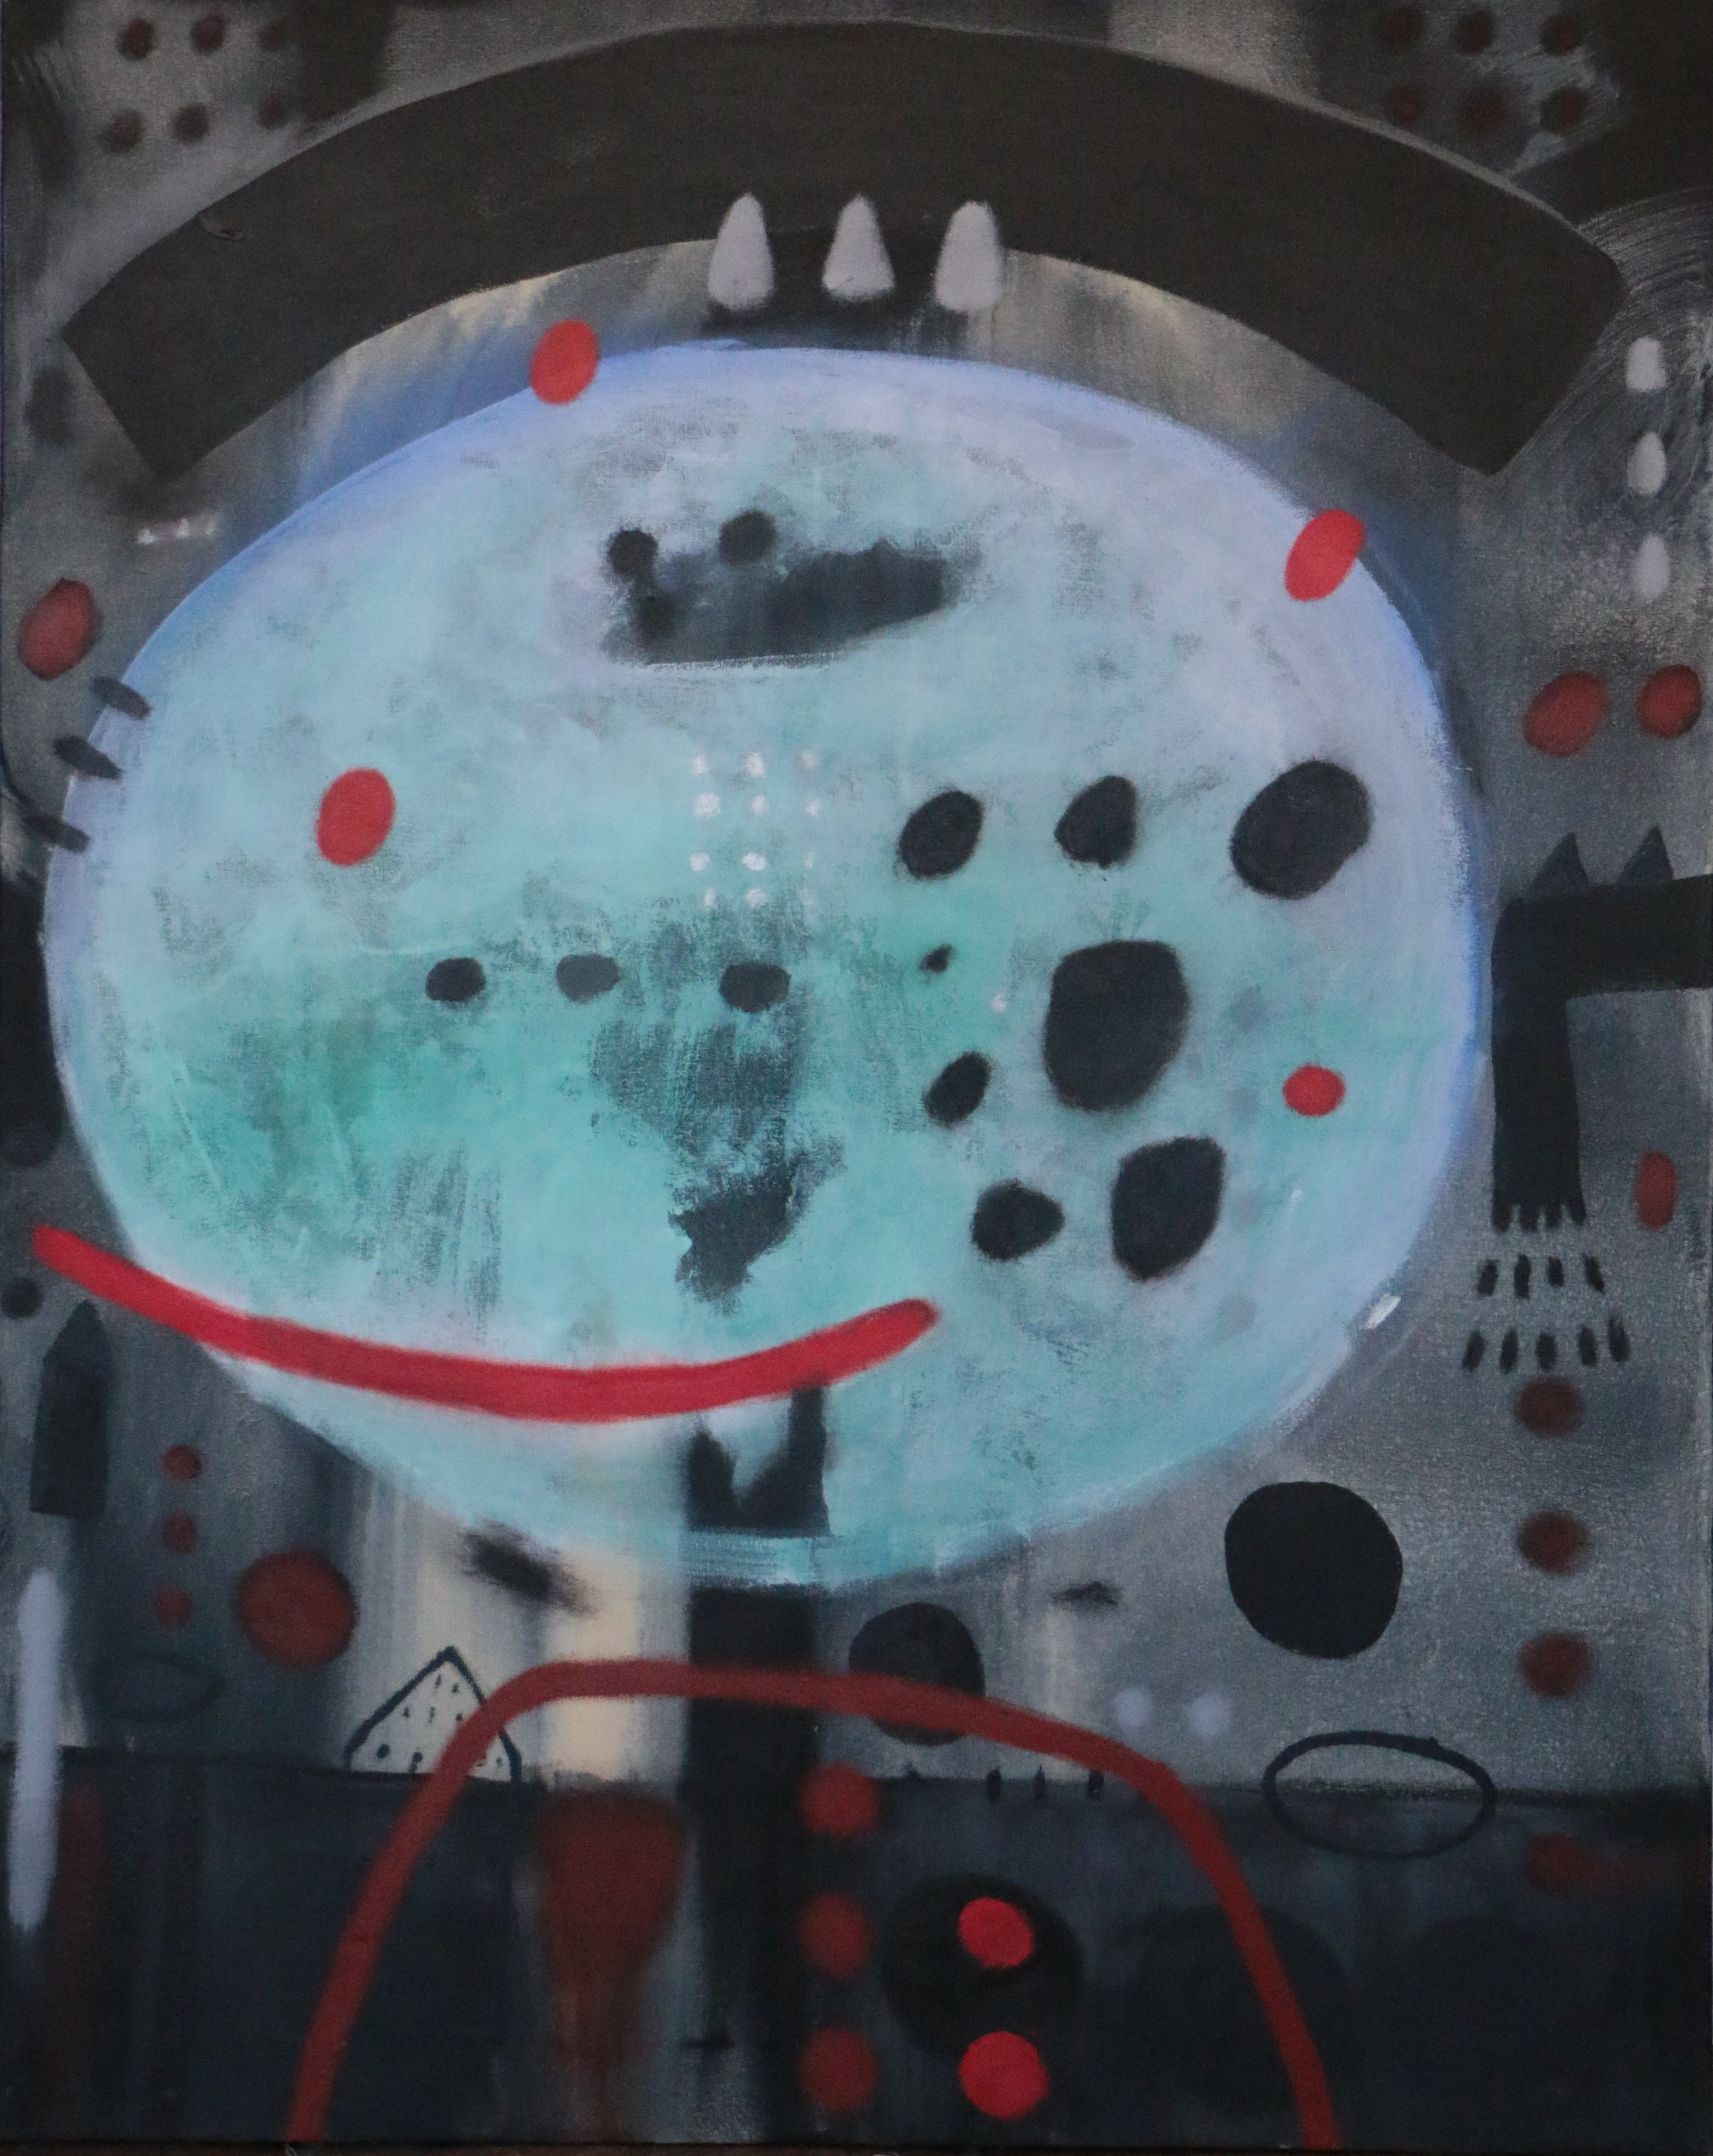 Didier Mayés,  Donza luna , 2018, Oil on canvas, 39.5 x 31.5 IN